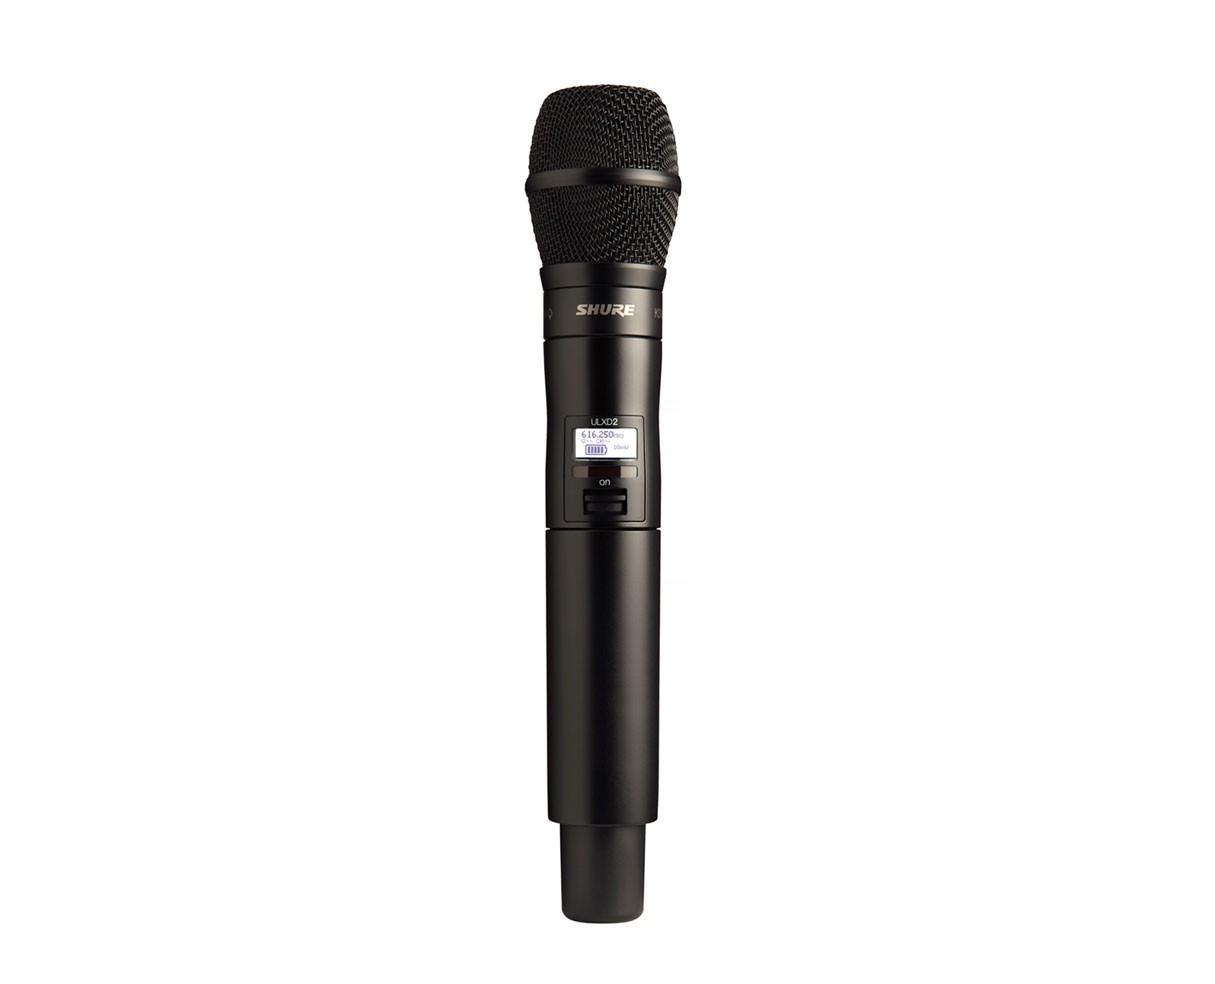 Shure ULXD2/KSM9 (Band V50)